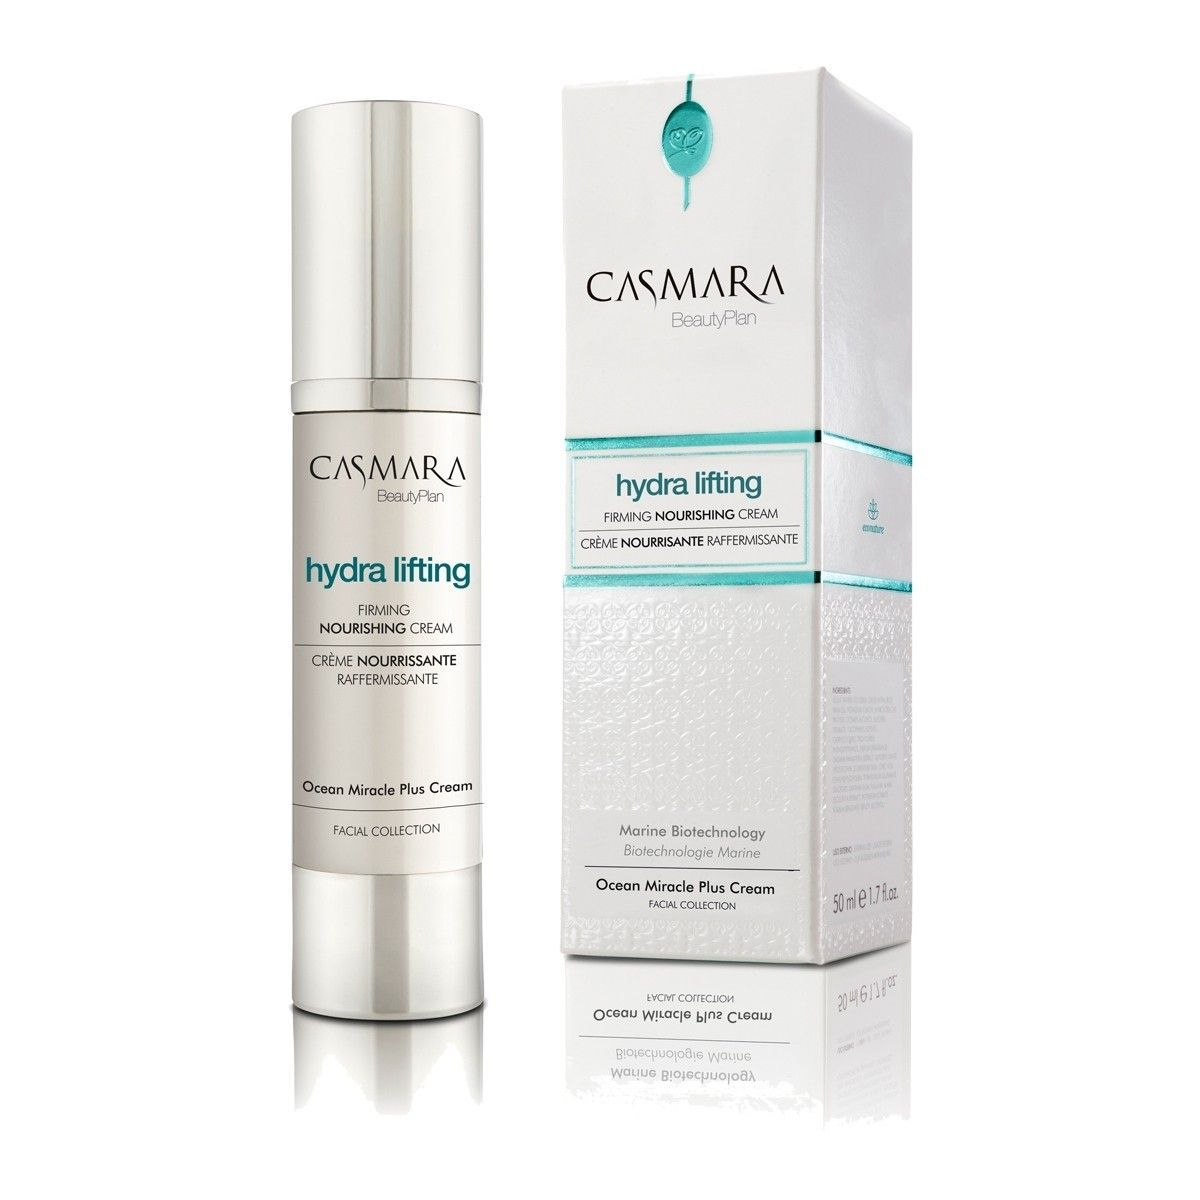 Afbeelding van Casmara Firming Nourishing Cream 50Ml Hydra Lifting / Beauty